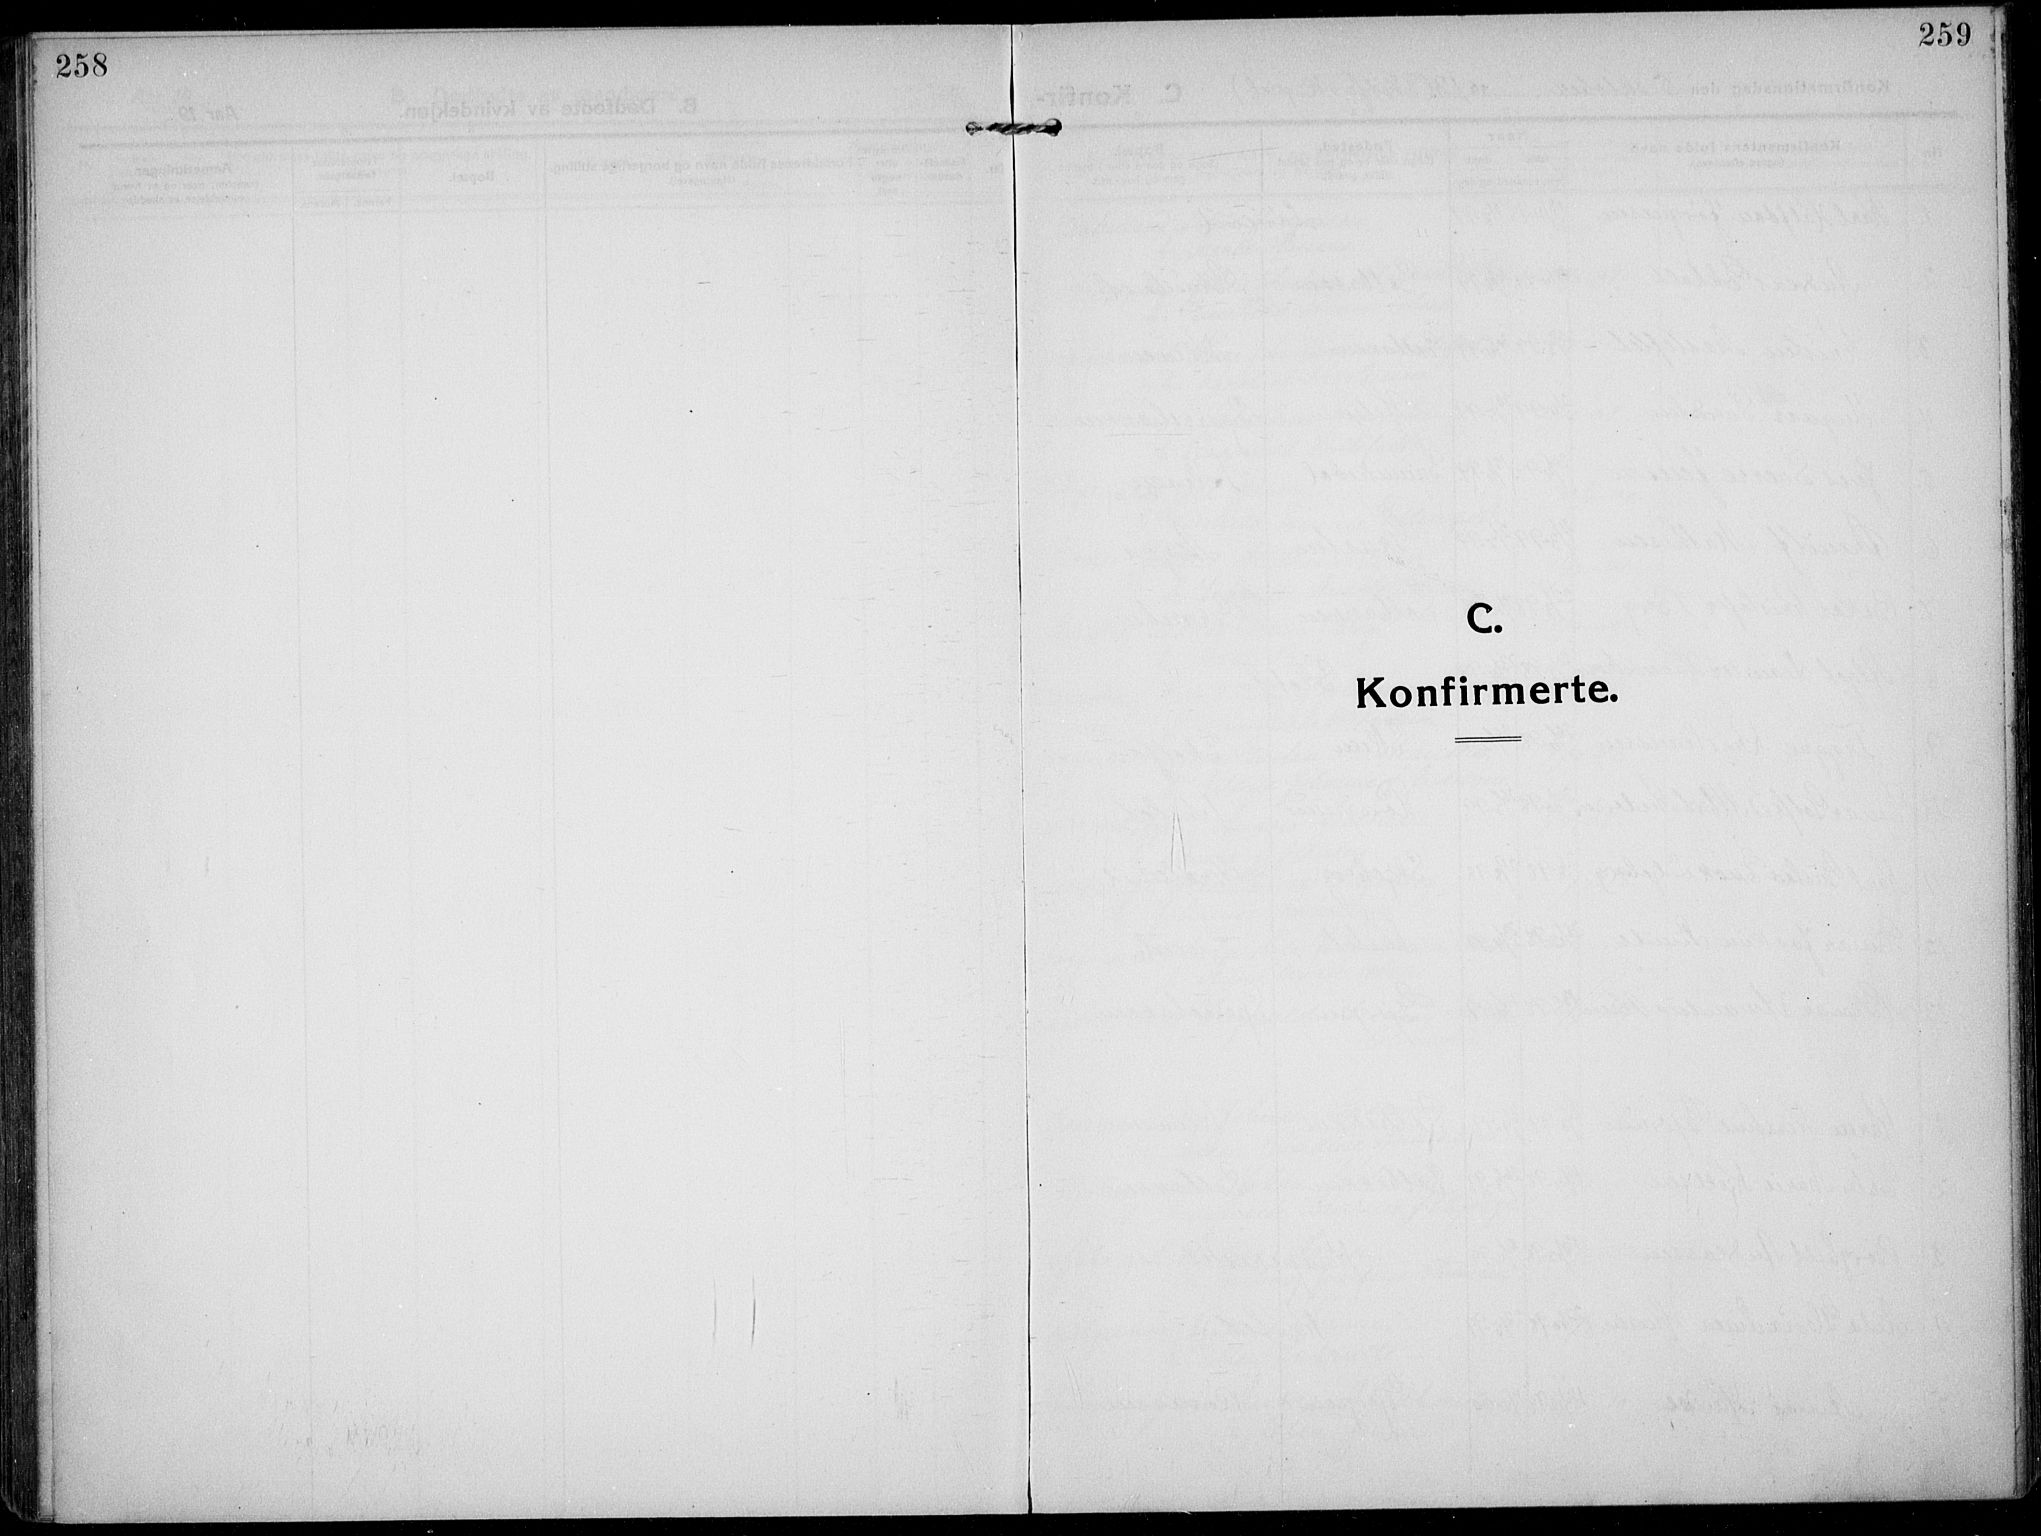 SAKO, Solum kirkebøker, F/Fb/L0004: Ministerialbok nr. II 4, 1913-1924, s. 258-259